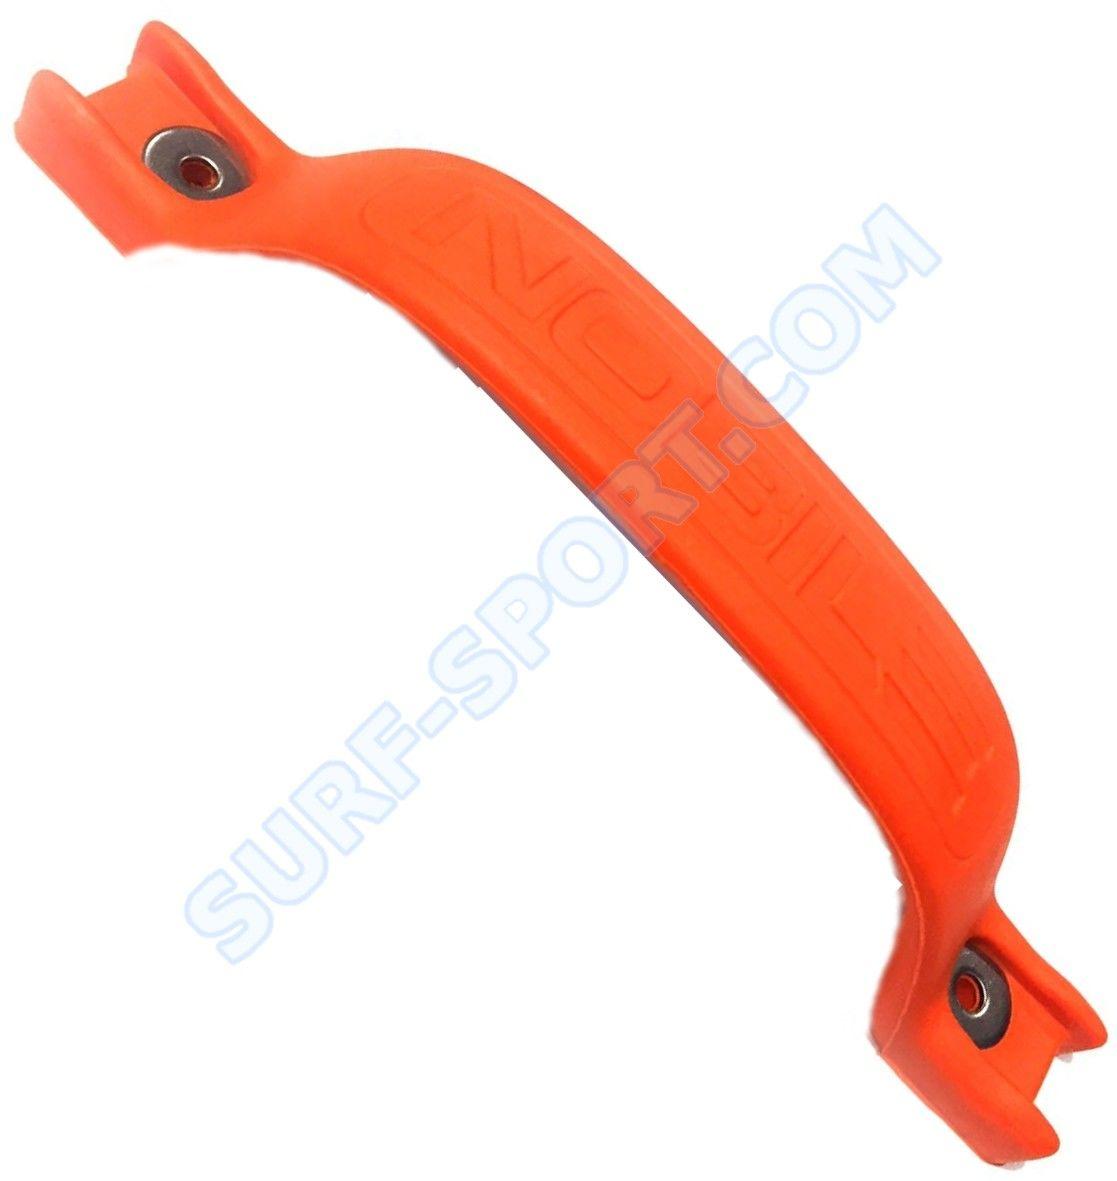 Rączka Kite Nobile Grab Handle 2014 Orange